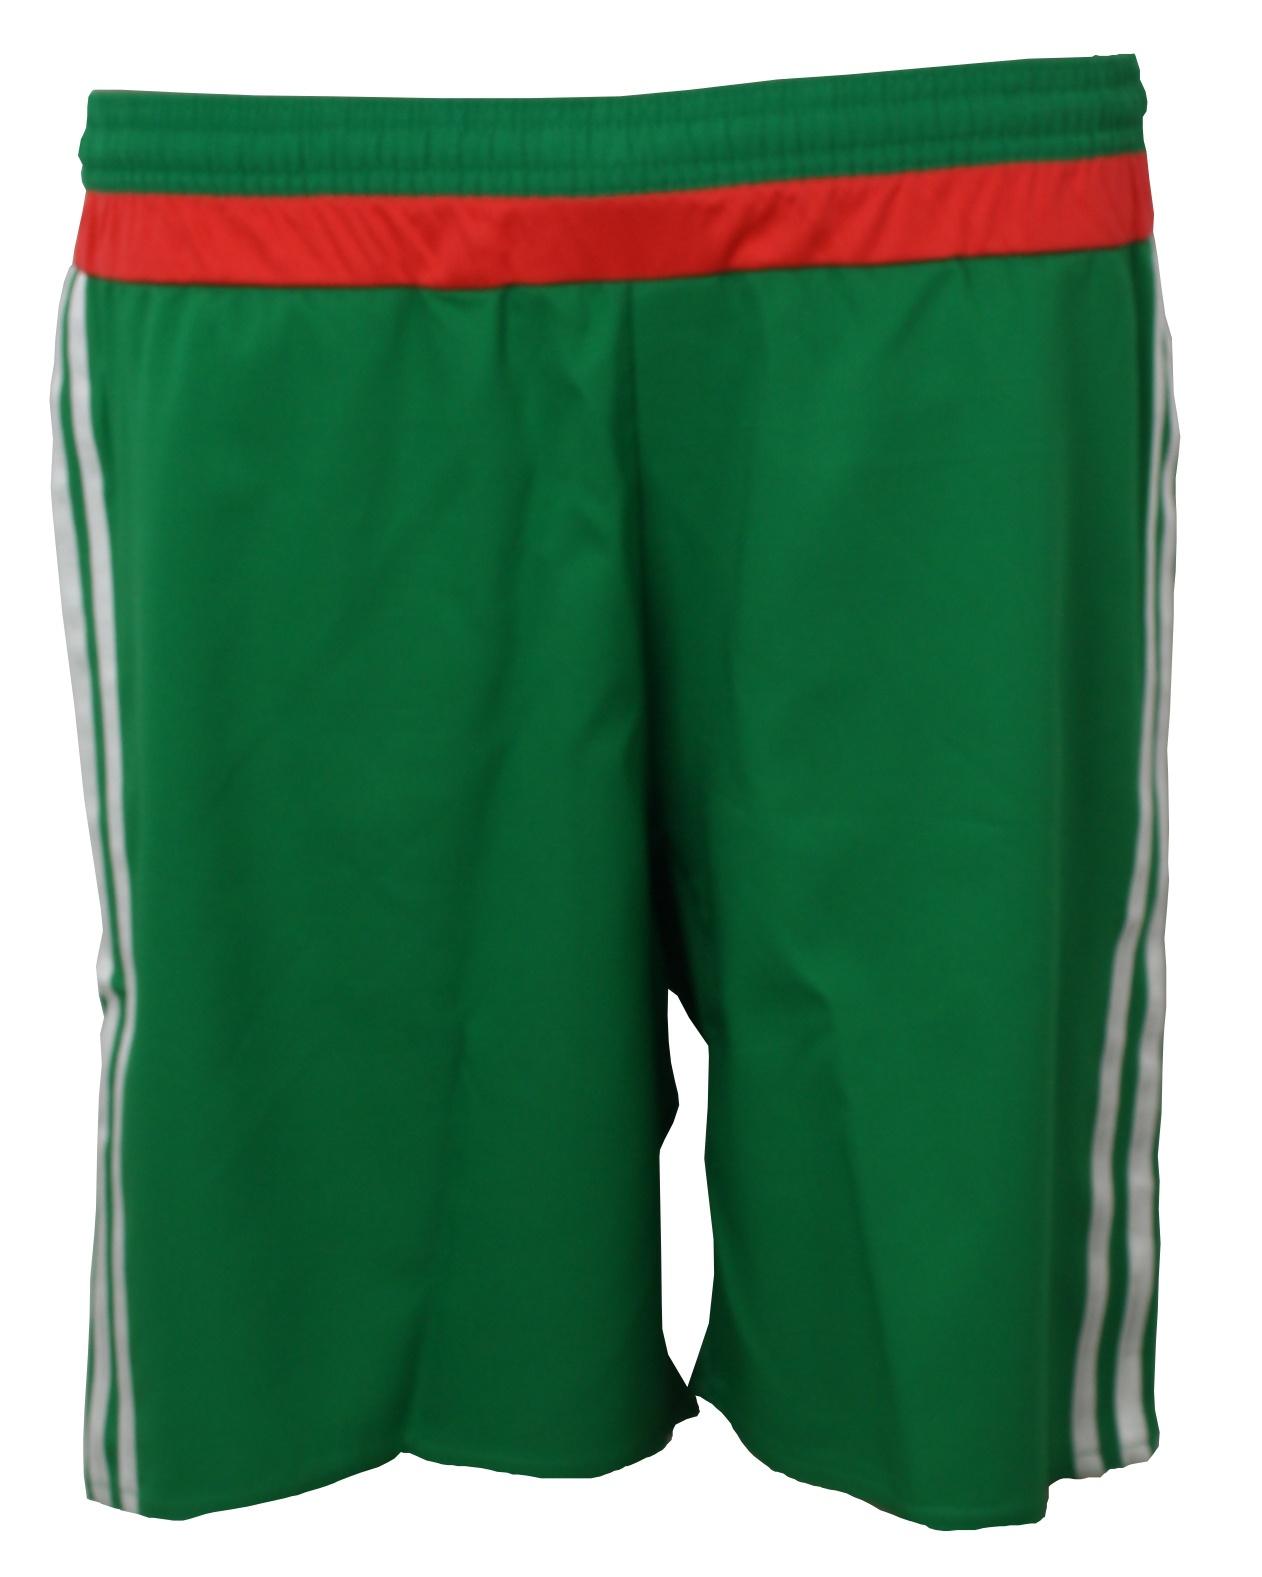 Torwart Hosen P Adizero Top 15 Männer grün rot  billig